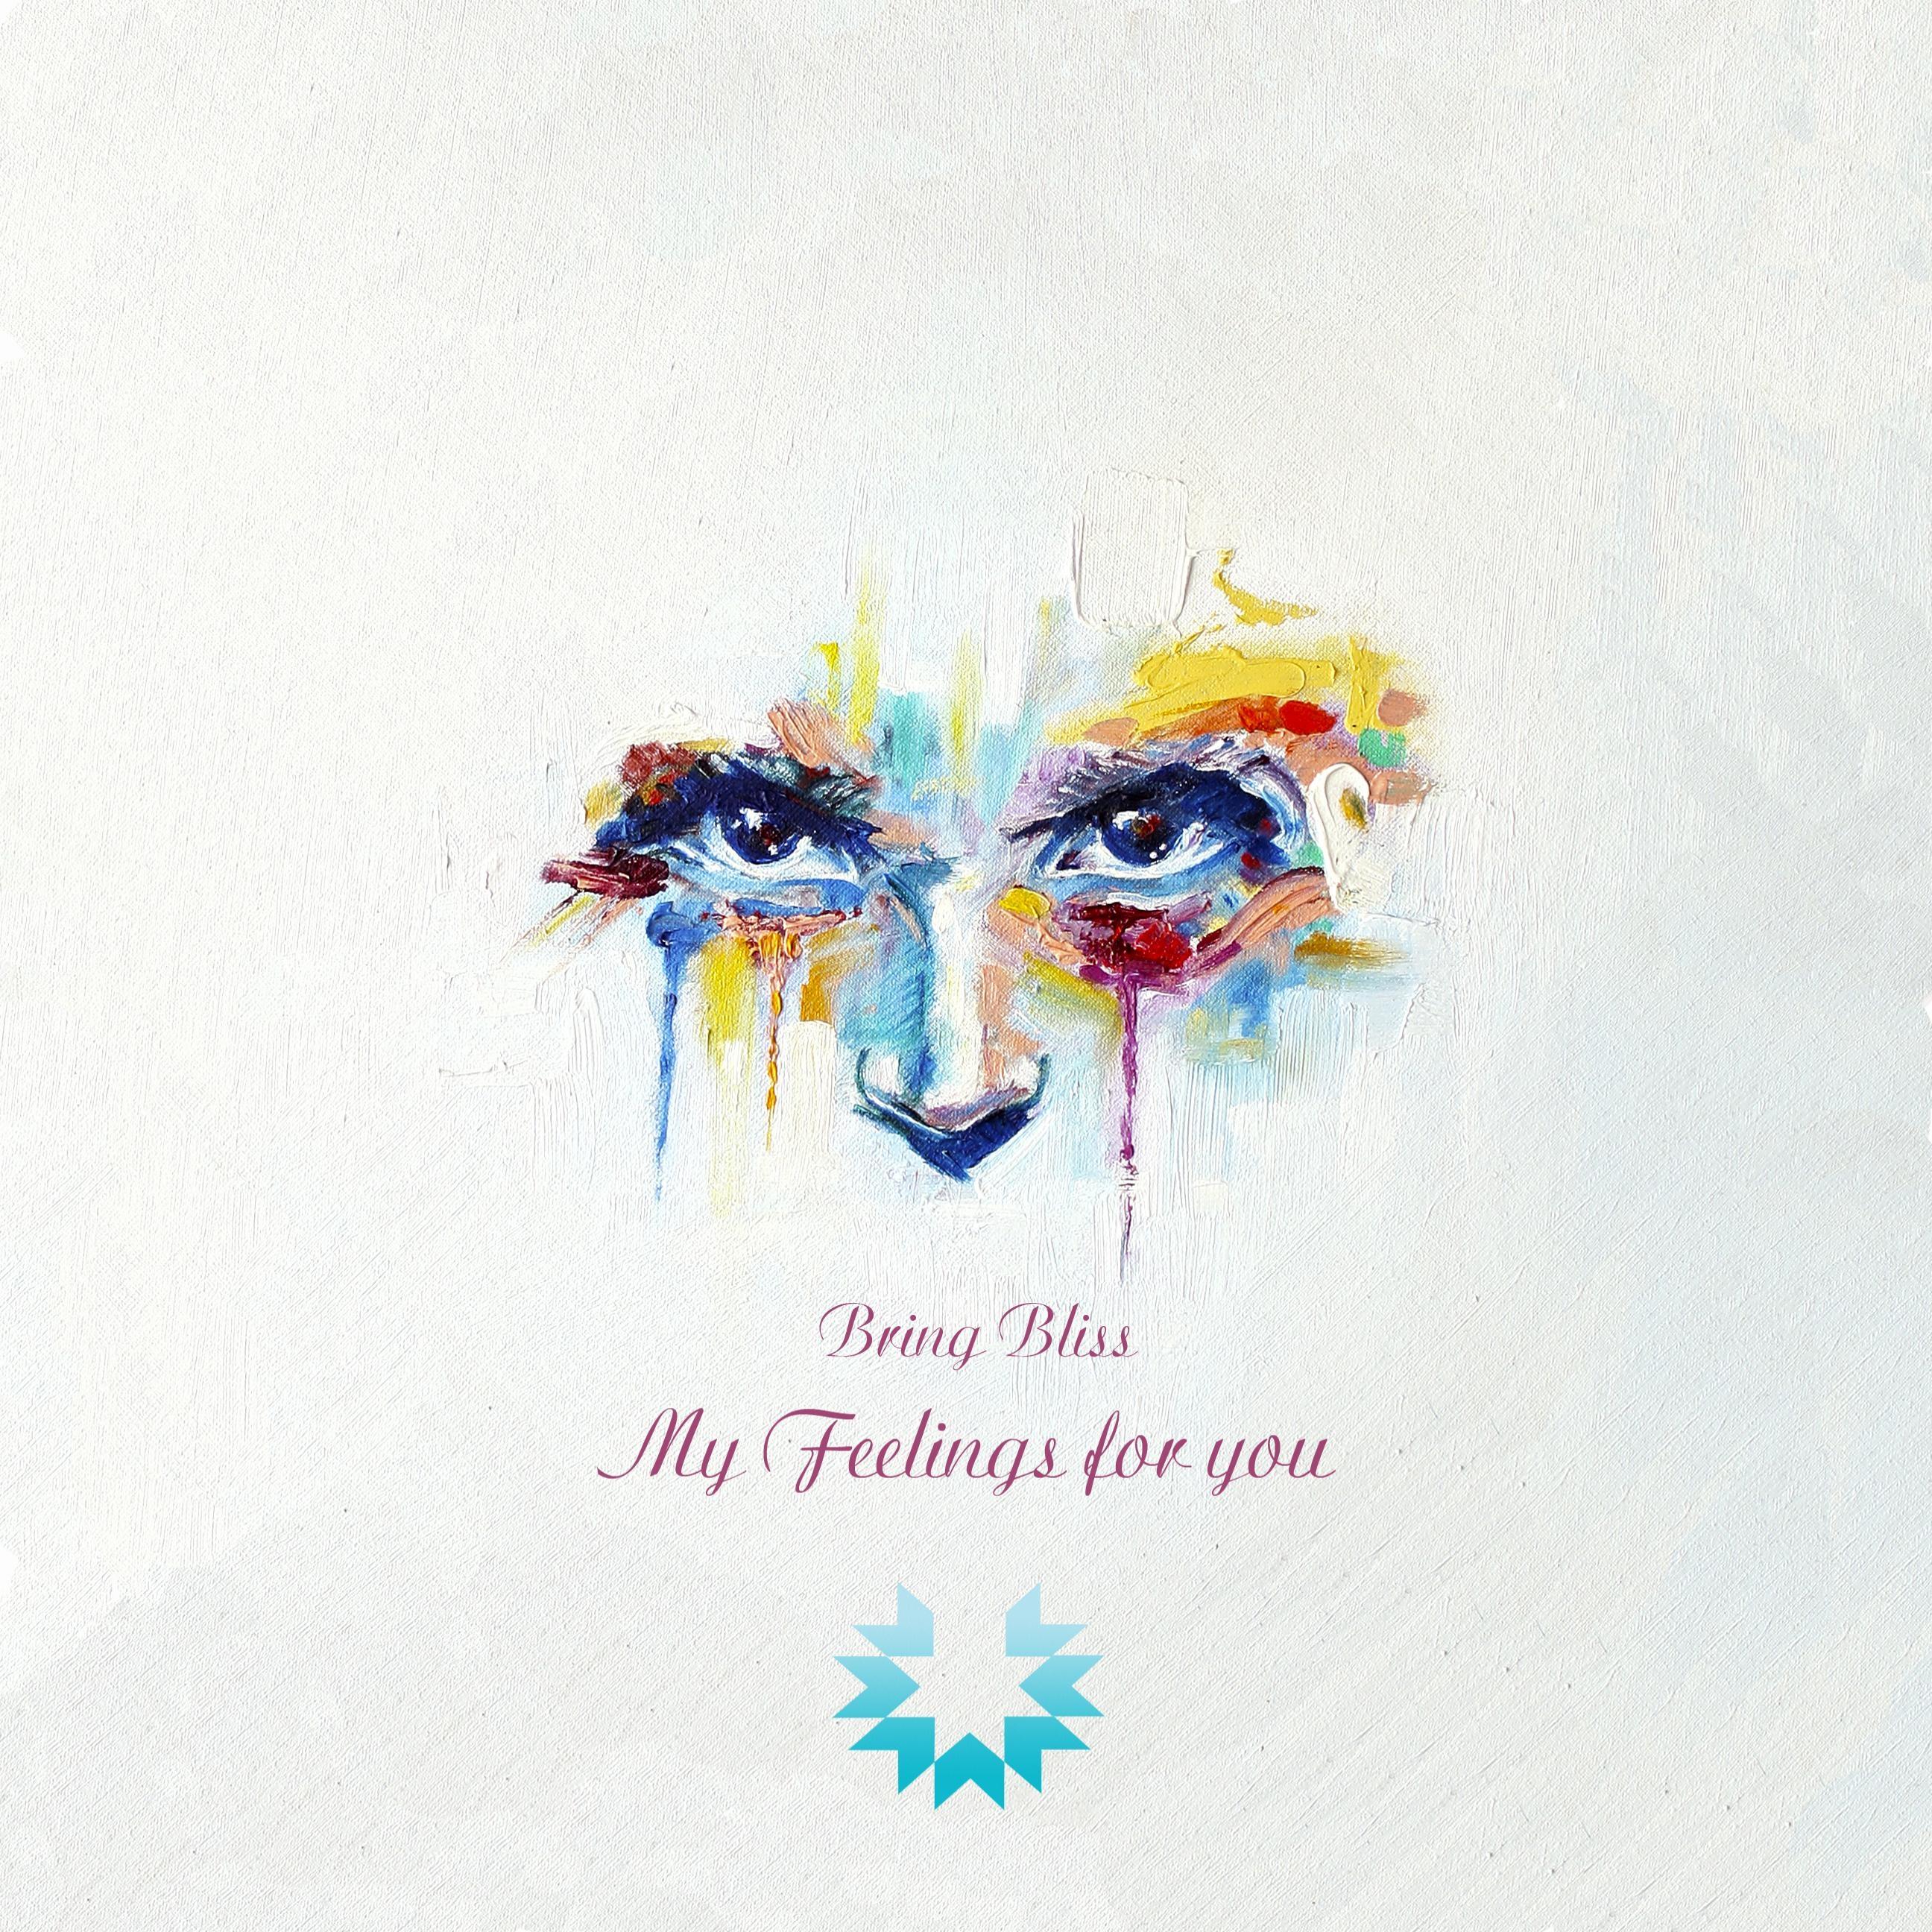 Bring Bliss - Promise (Original Mix)